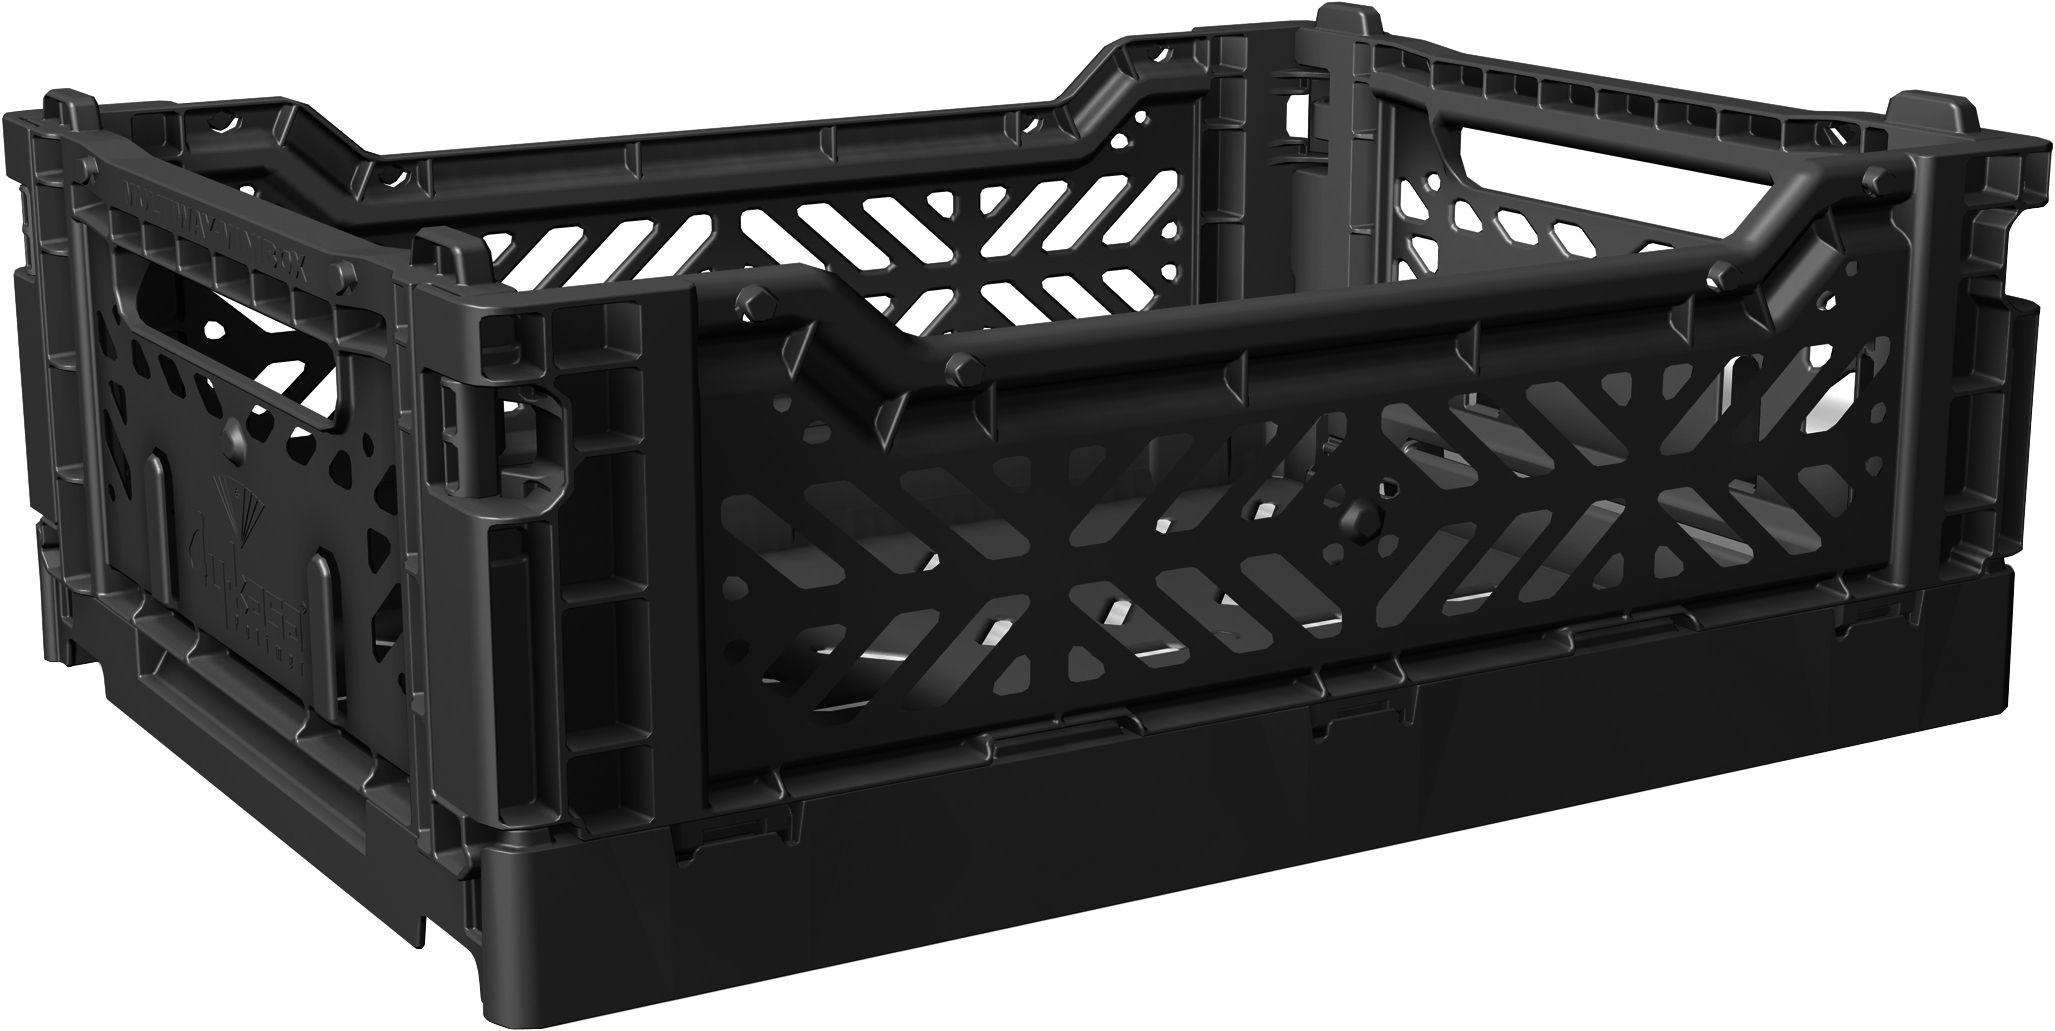 Accessories - Desk & Office Accessories - Midi Box Storage rack - Foldable L 40 cm by Surplus Systems - Pop Corn - Black - Polypropylene